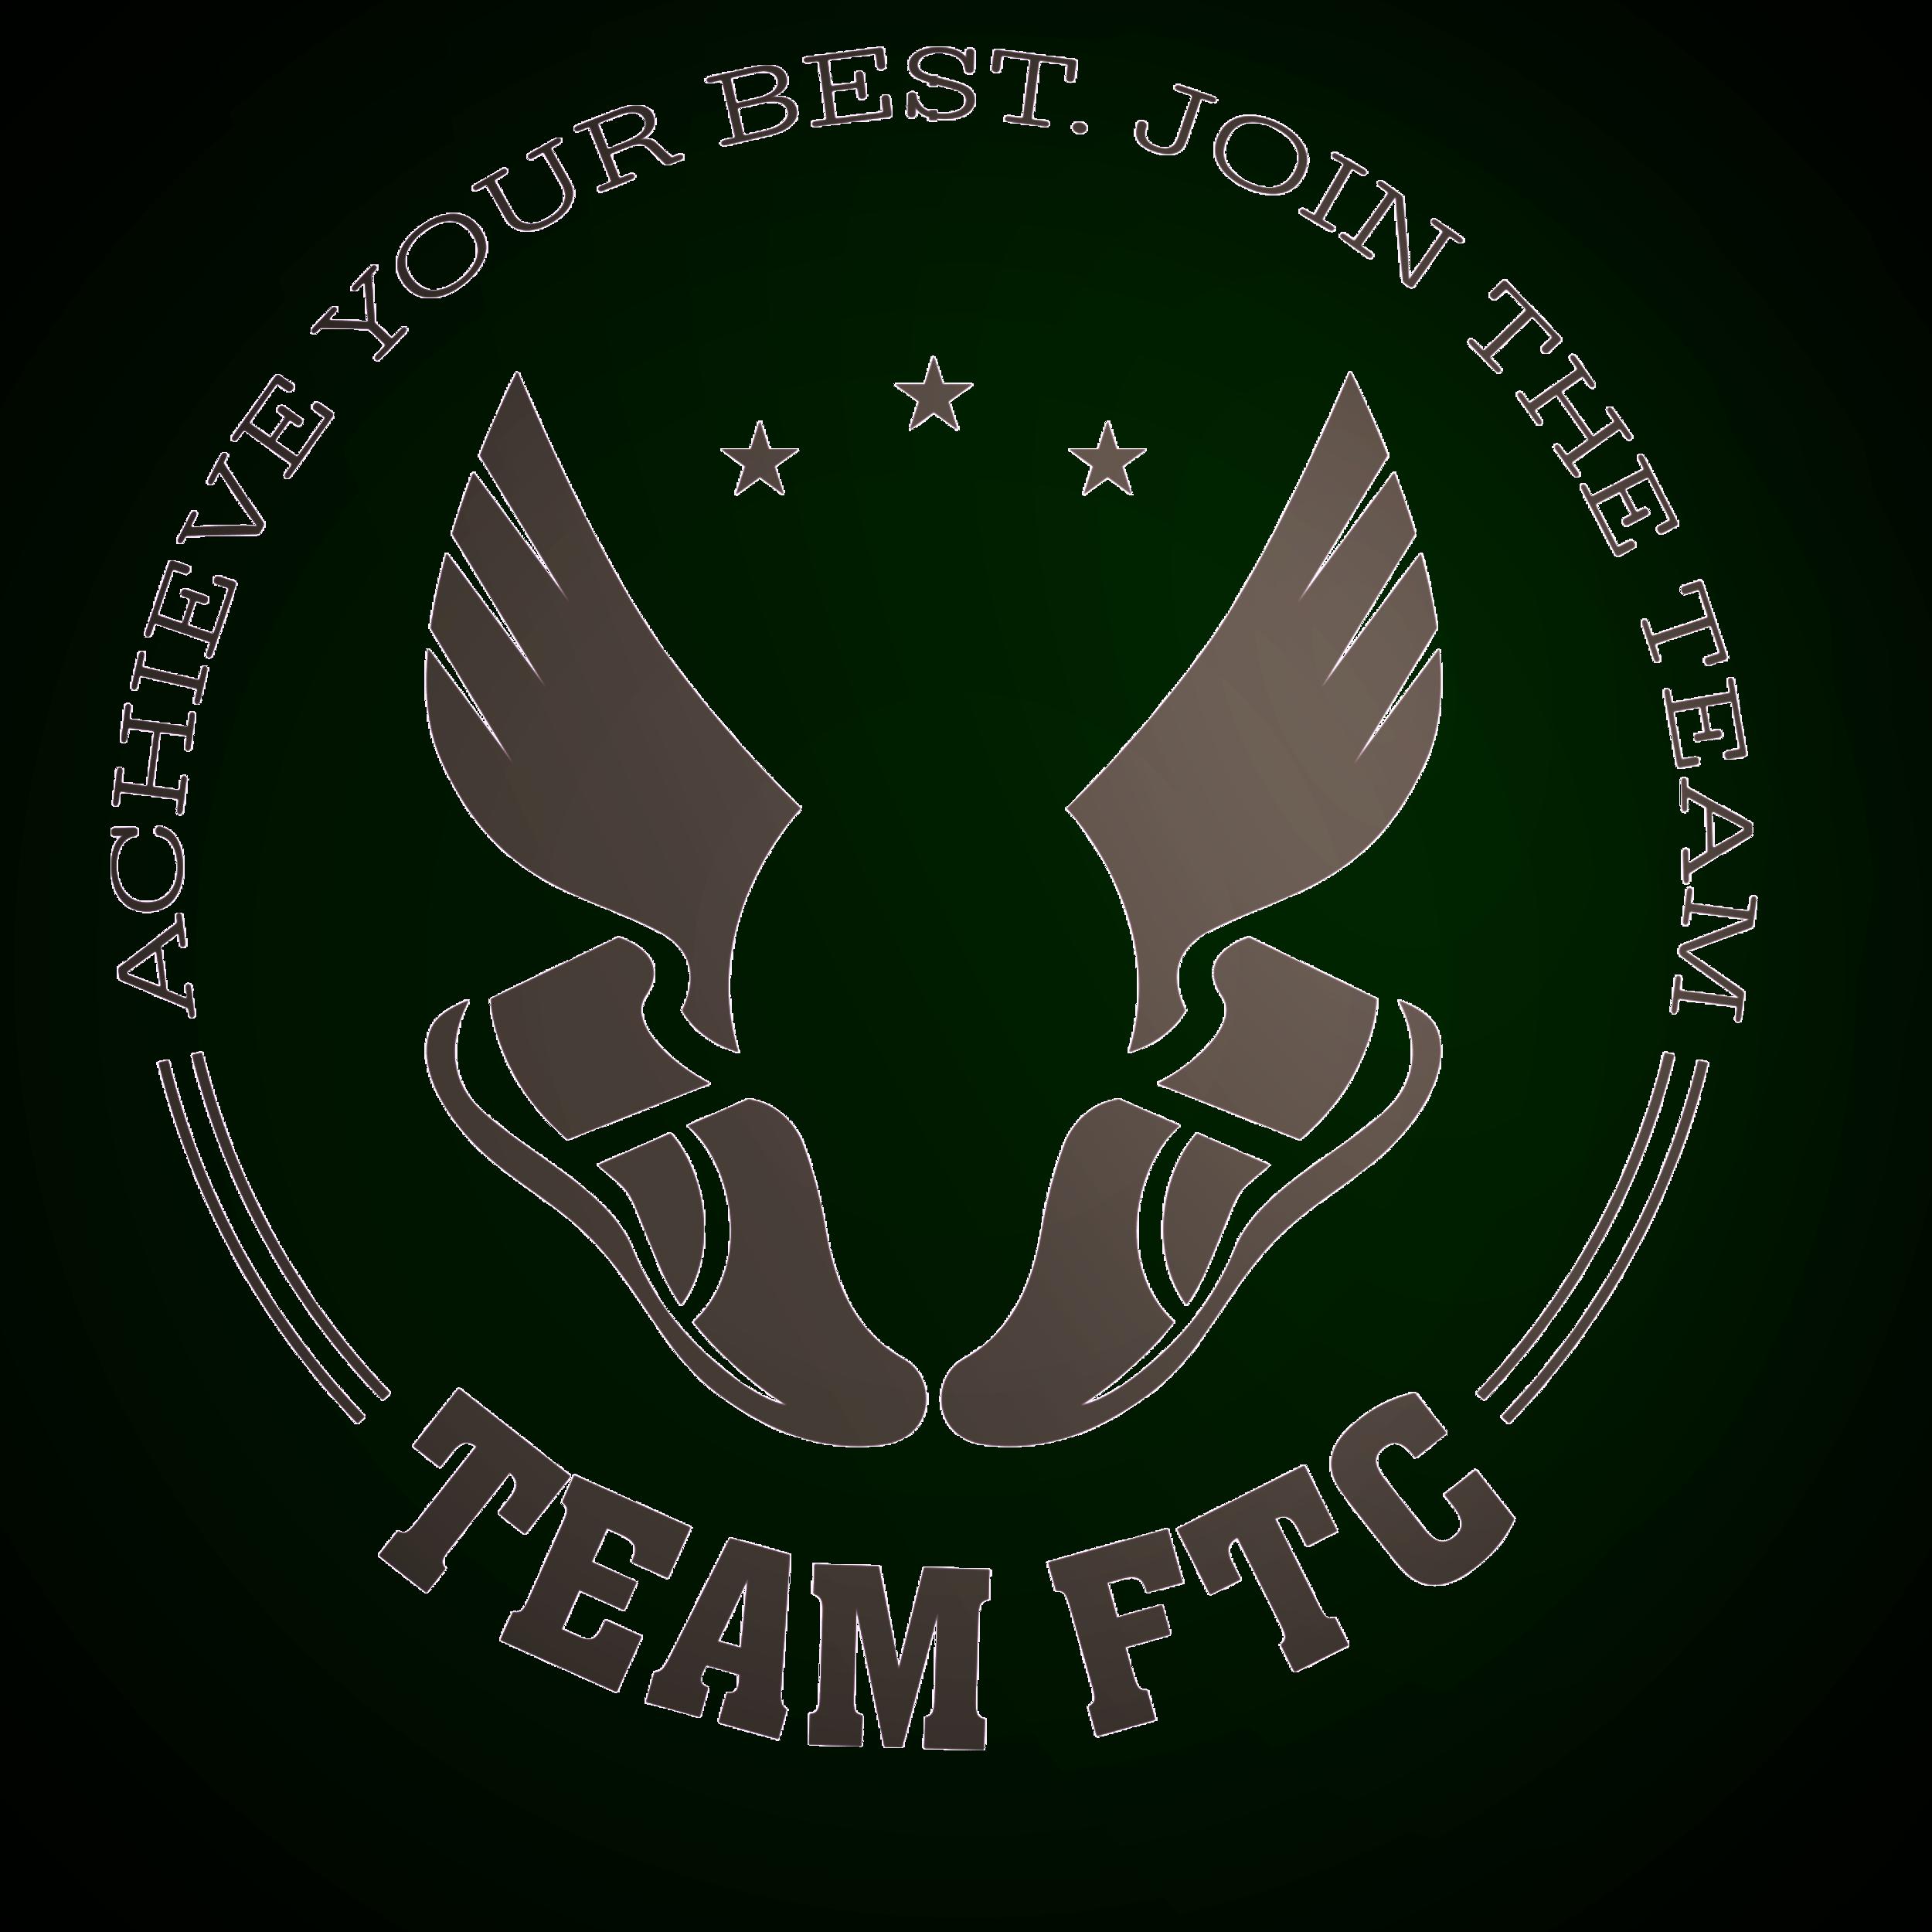 team ftc logo.png